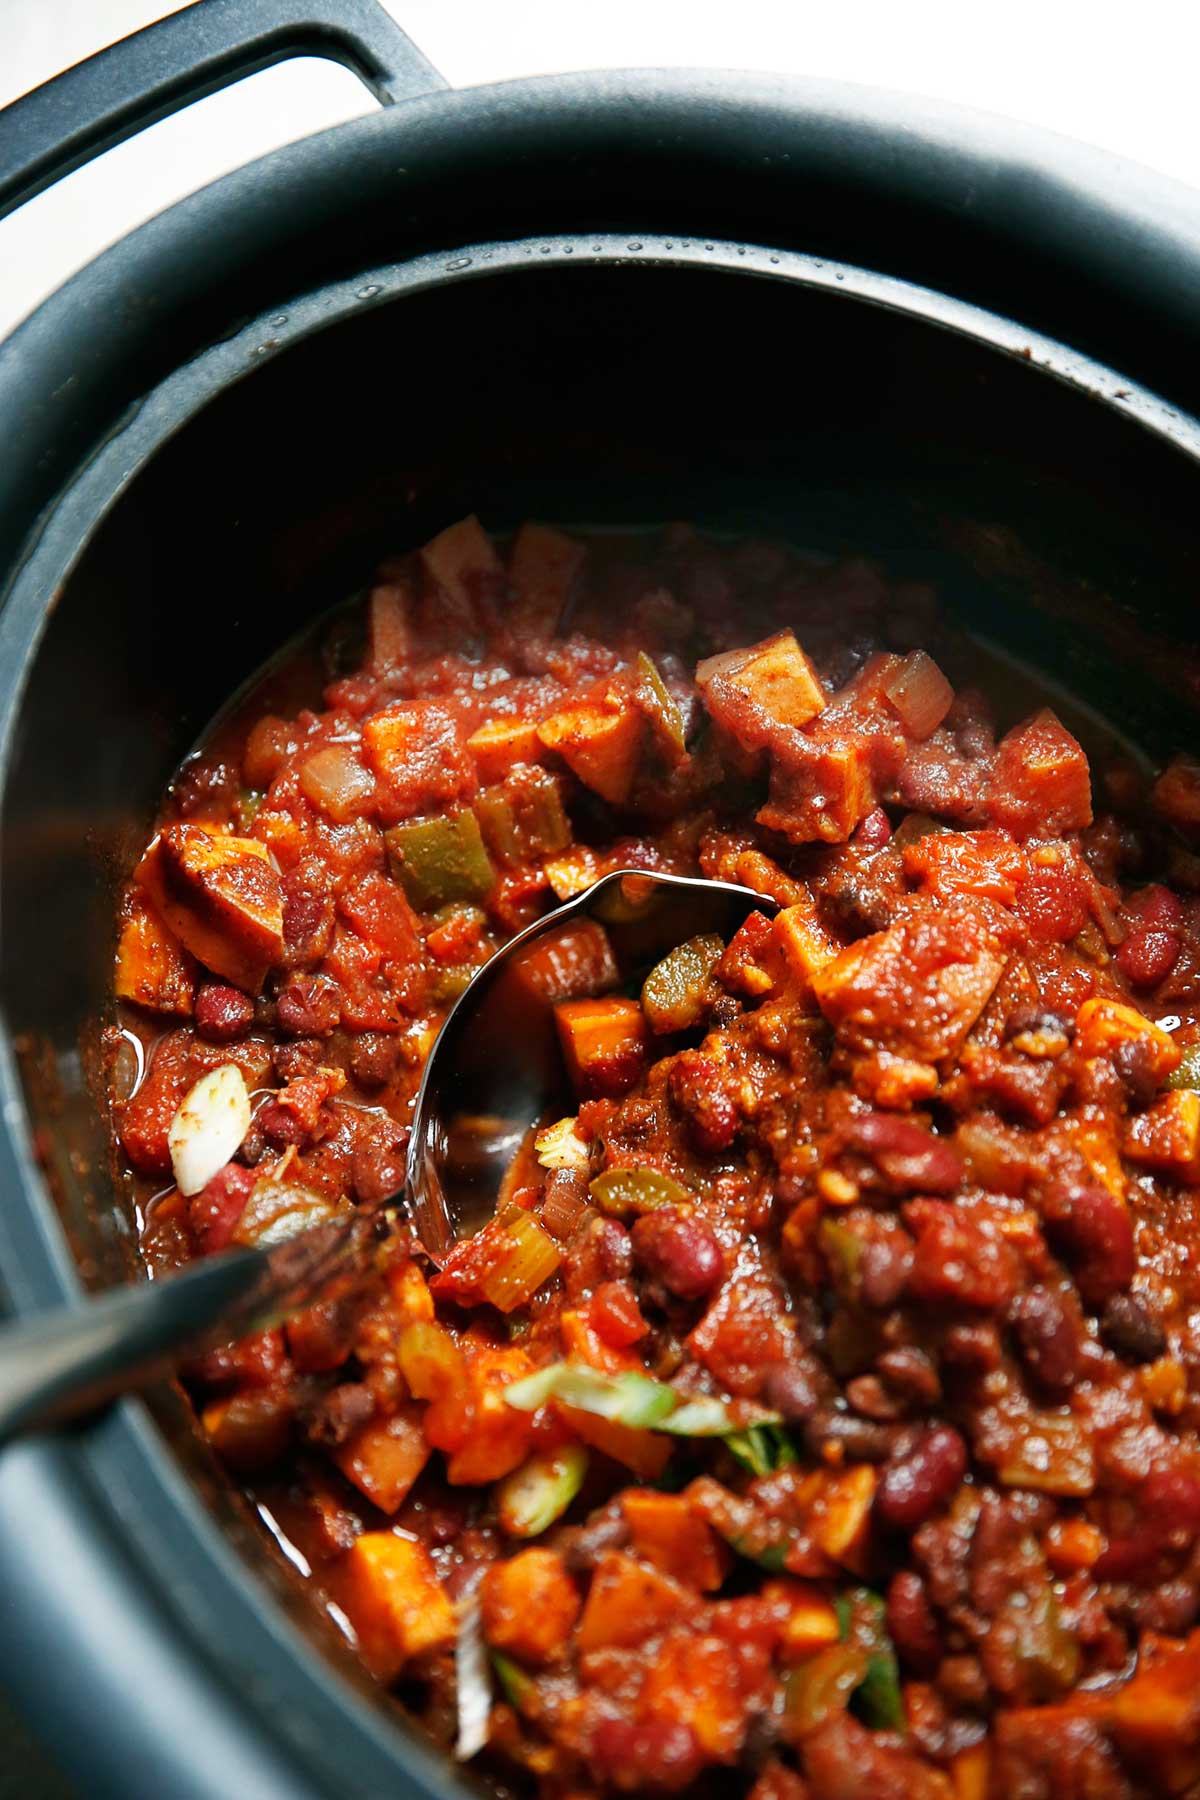 Sweet Potato Chili Slow Cooker  Slow Cooker Sweet Potato Chili Lexi s Clean Kitchen